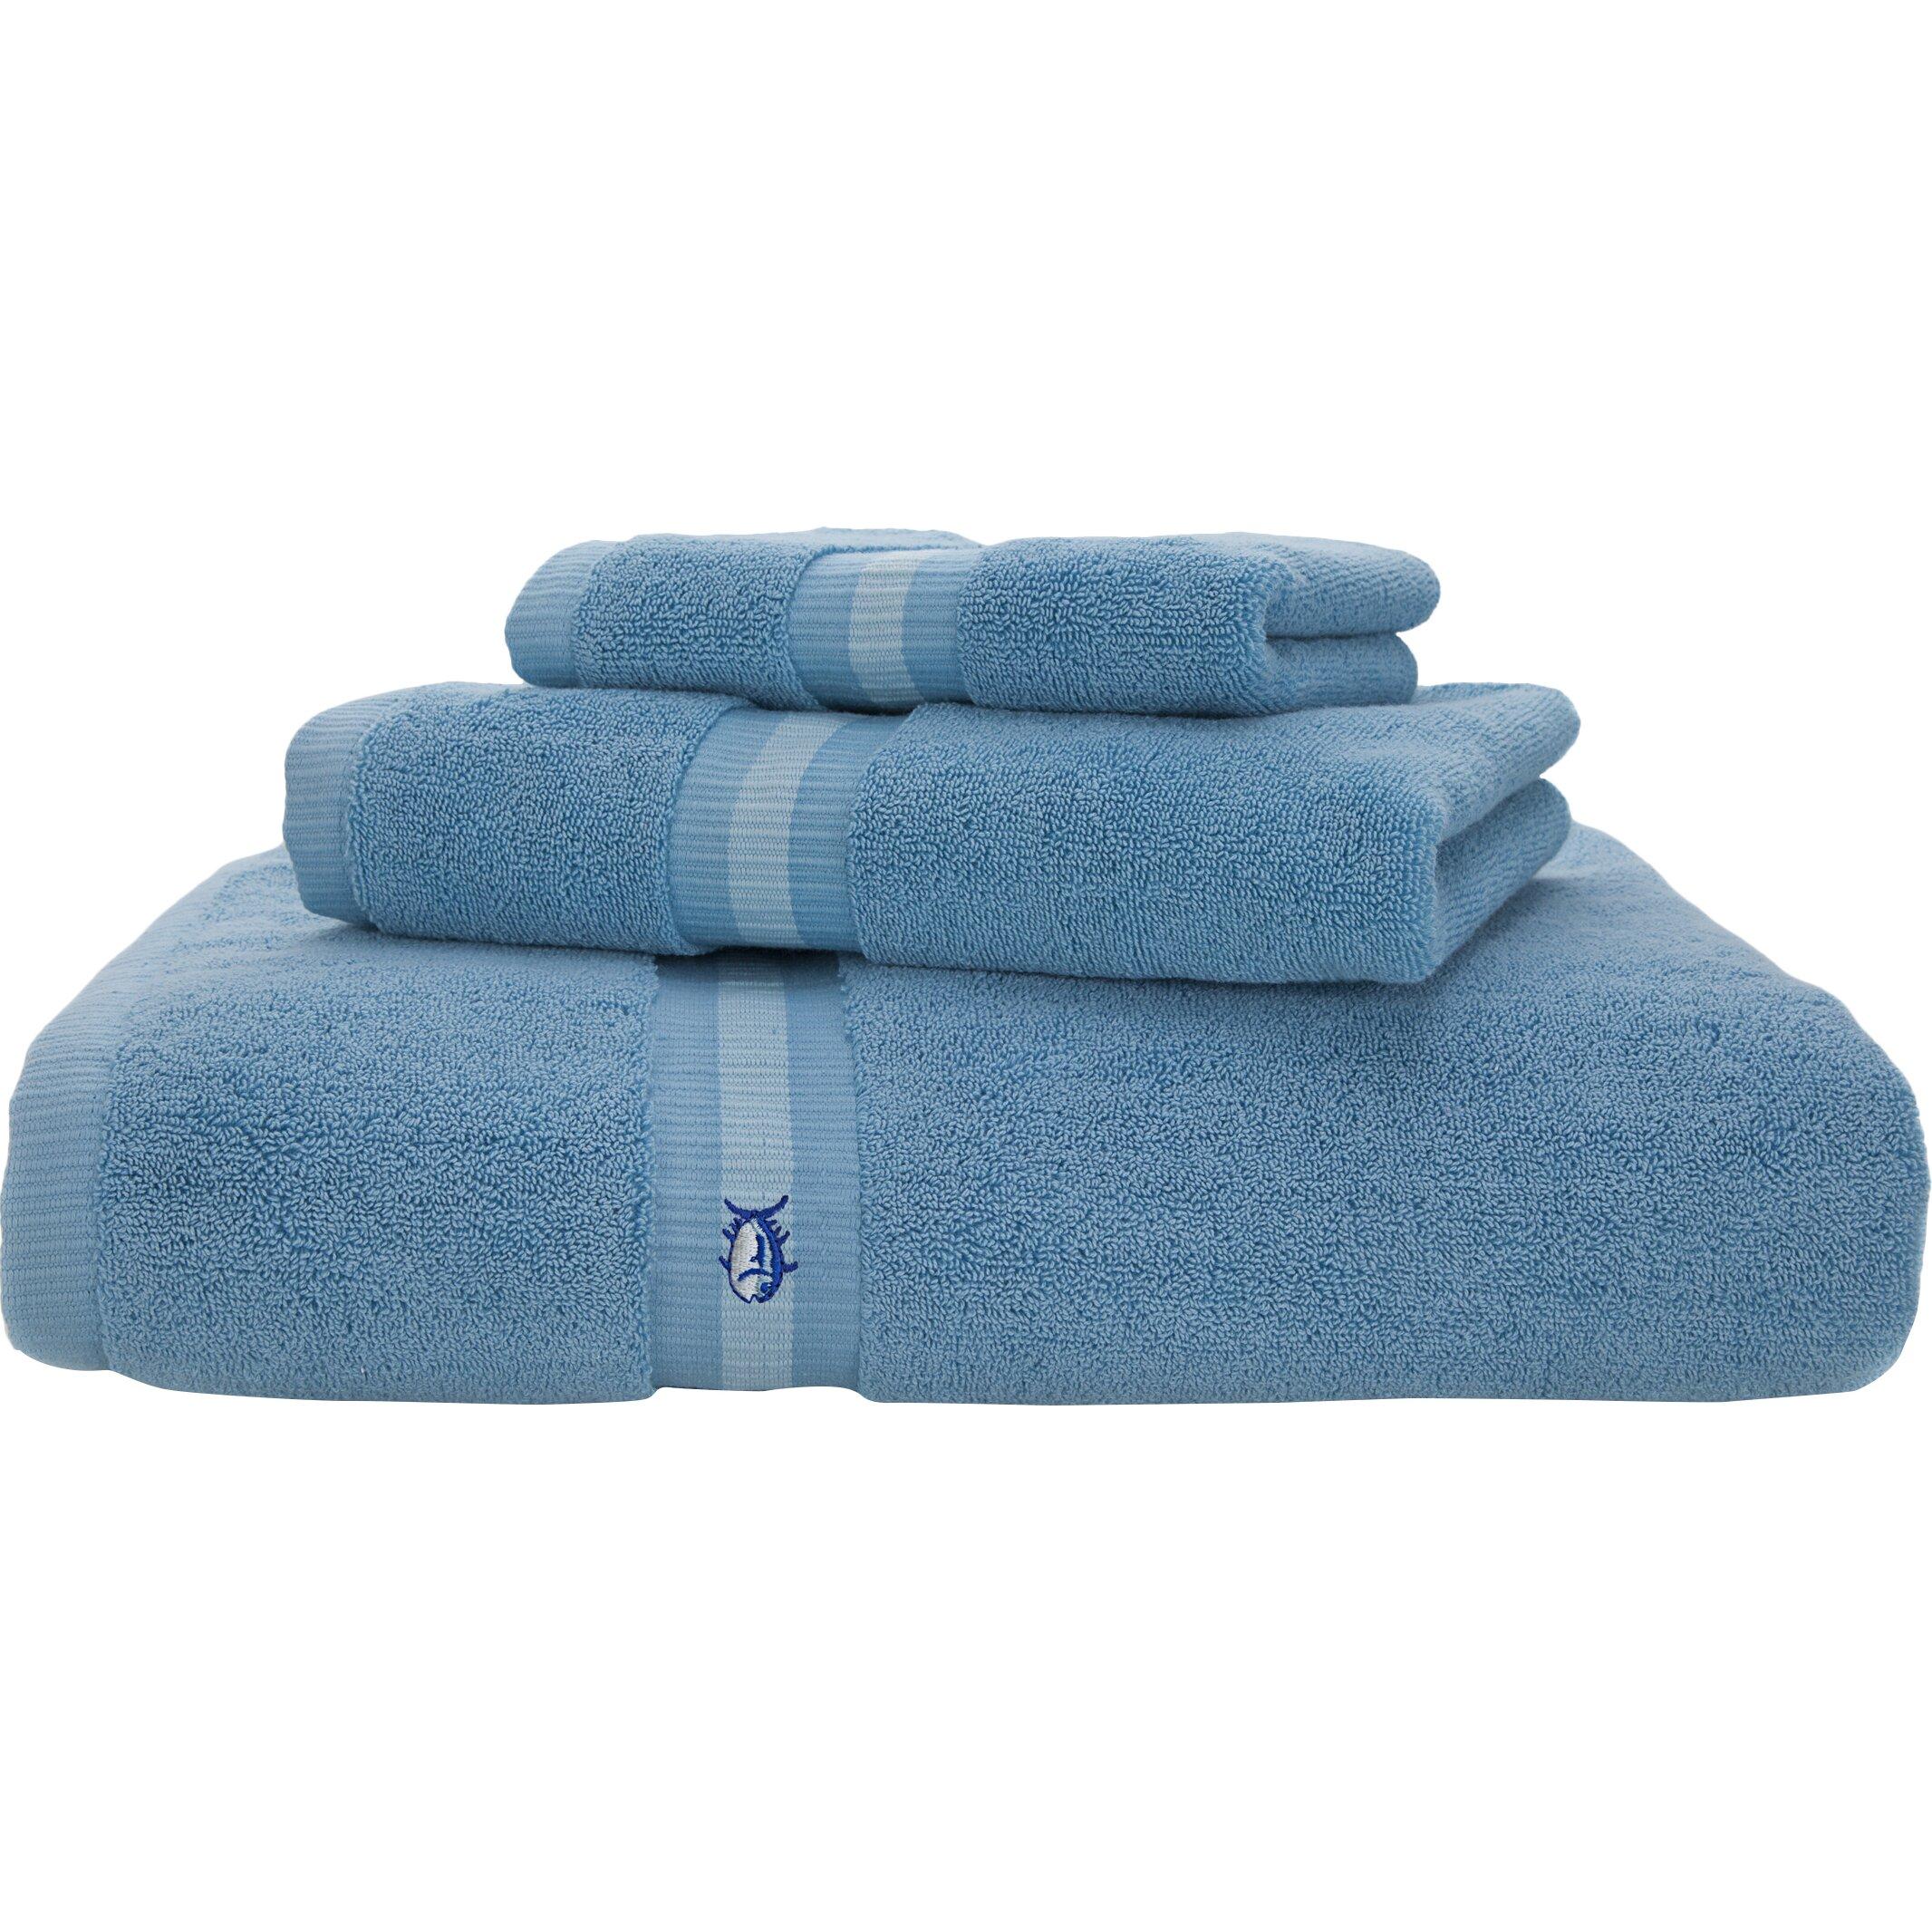 Decorative Hand Towels For Powder Room Southern Tide Skipjack Hand Towel Reviews Wayfair